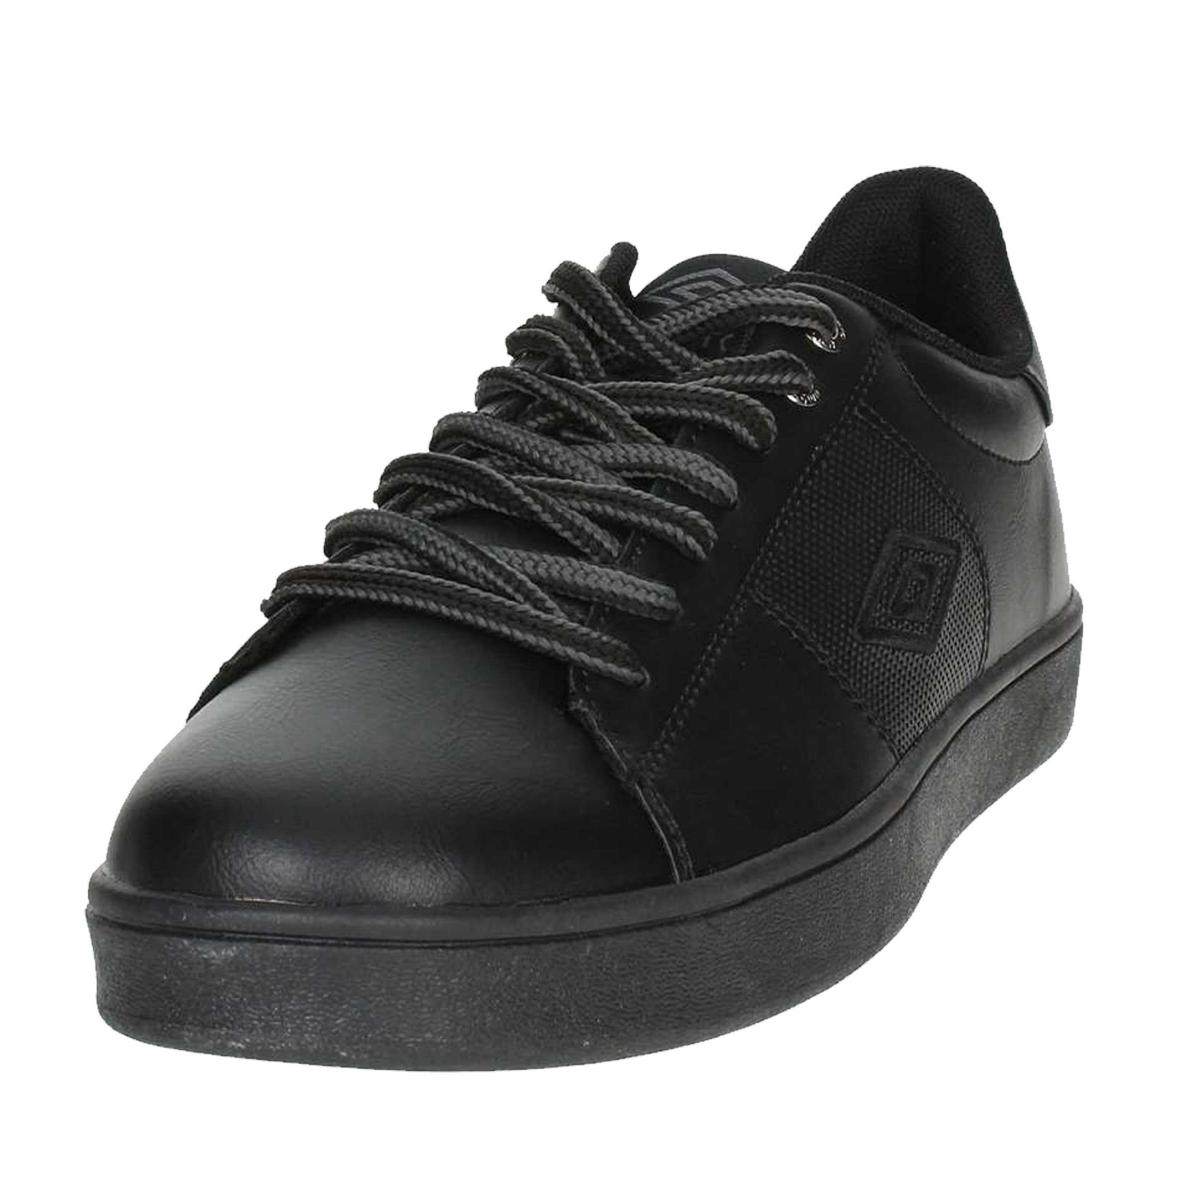 Scarpe Sneakers Umbro basse da uomo rif. RFP38000S-TOB/BLC